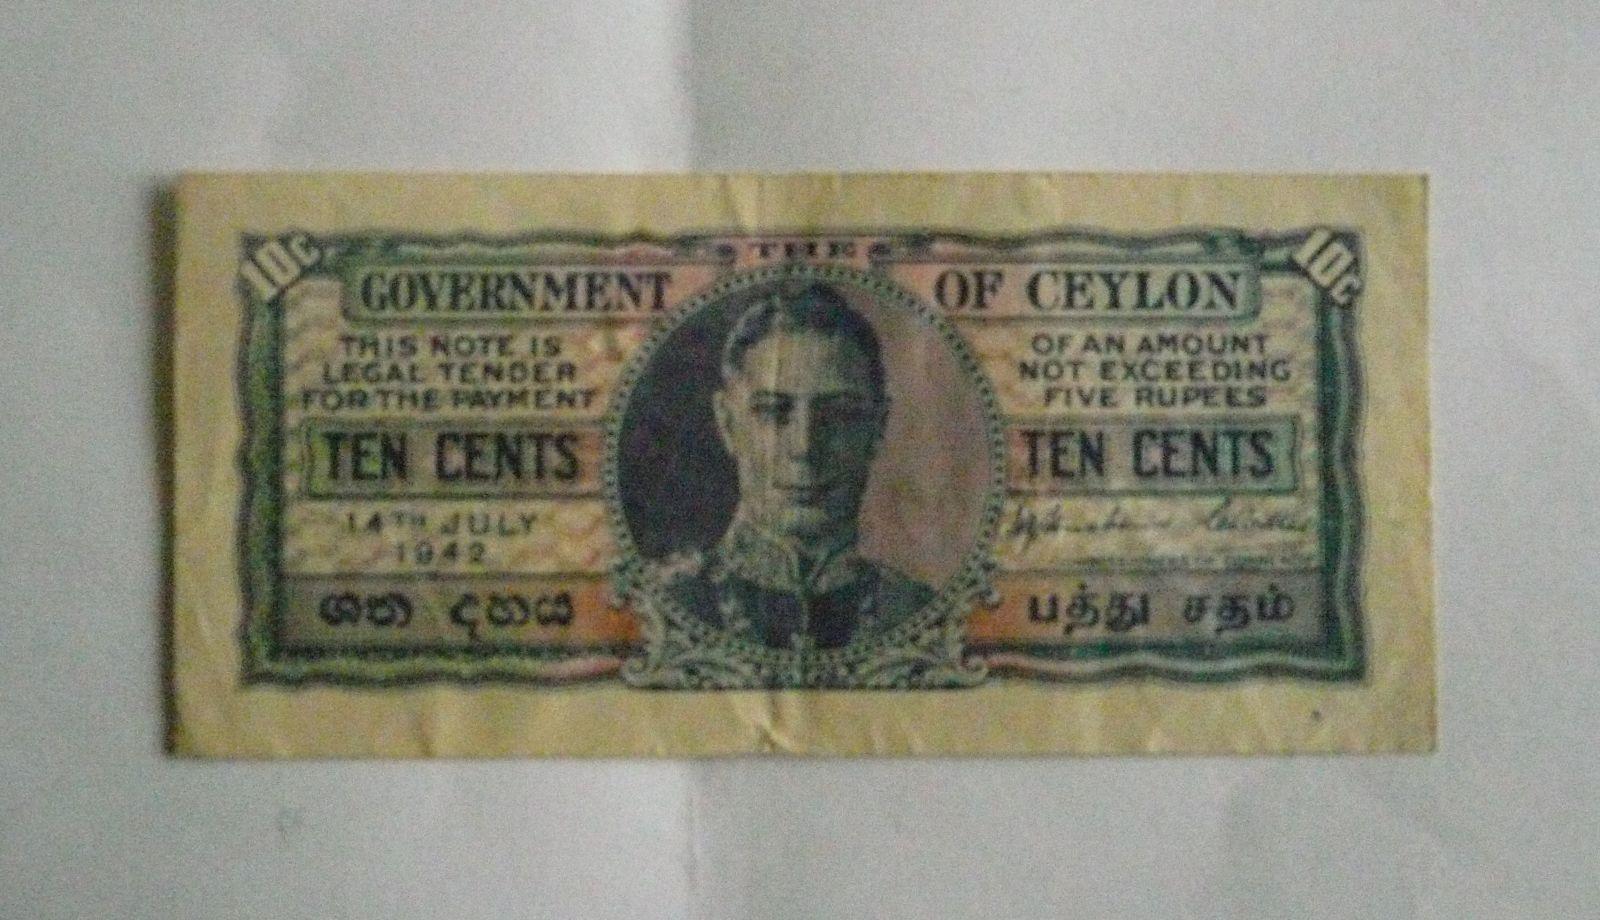 10 Cent, Ceylon, 1942